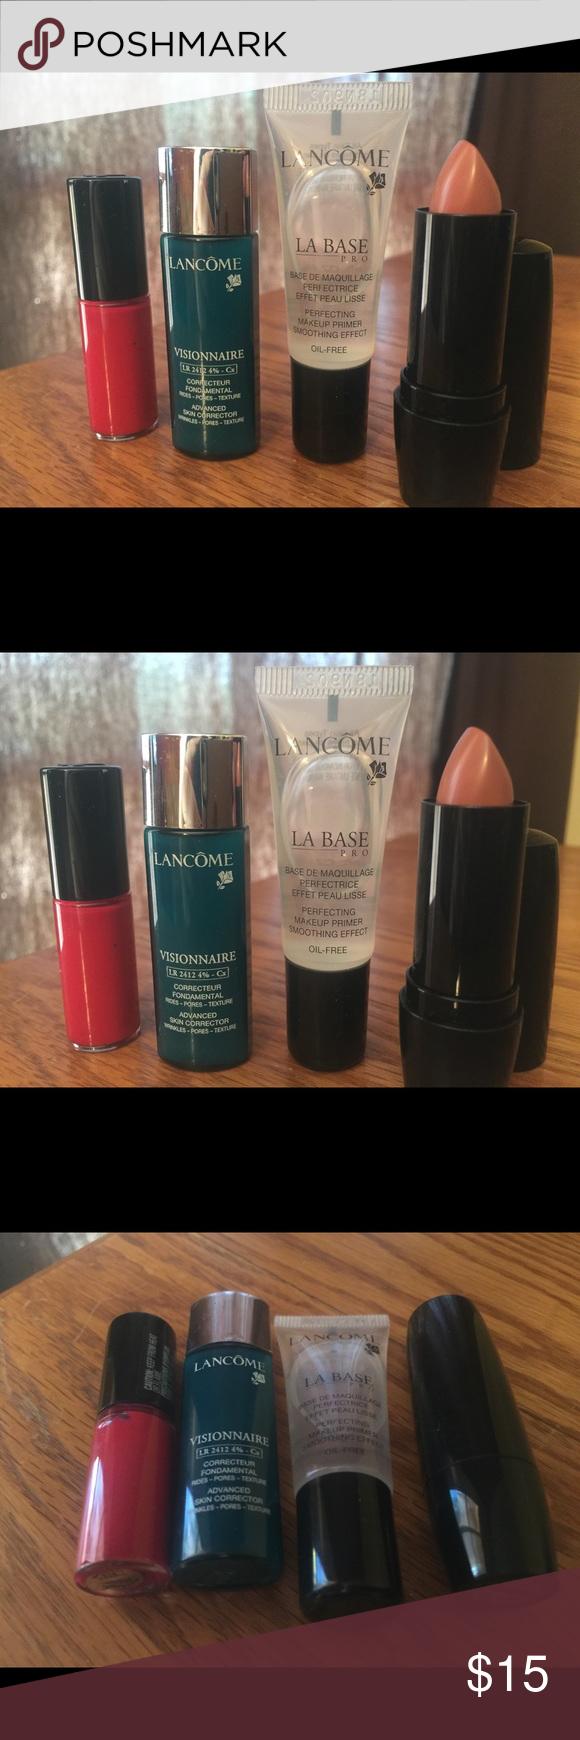 Lancôme Beauty Lot of four Lancôme Beauty products 1